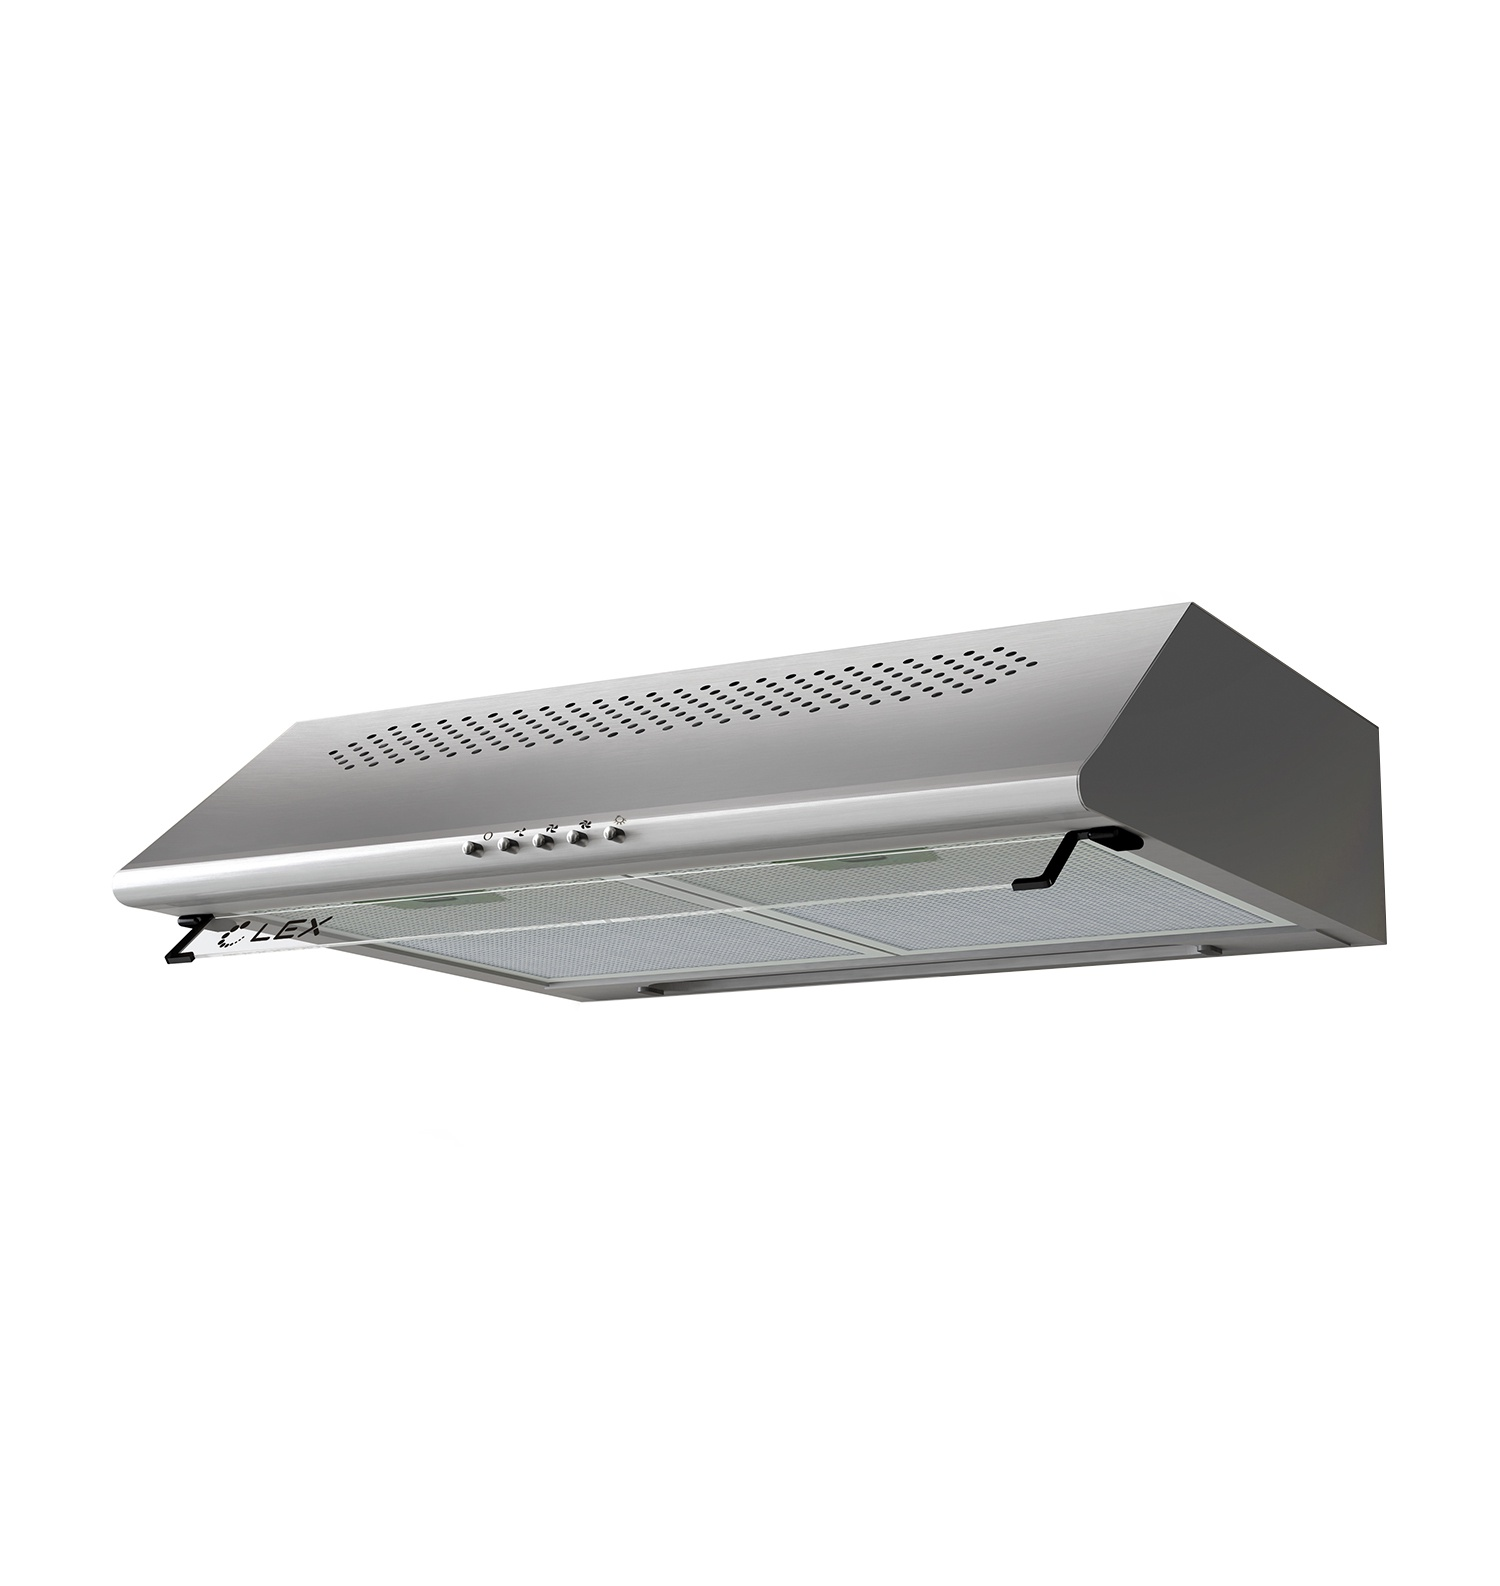 Вытяжка Lex Simple 2M 600 Inox, серый металлик